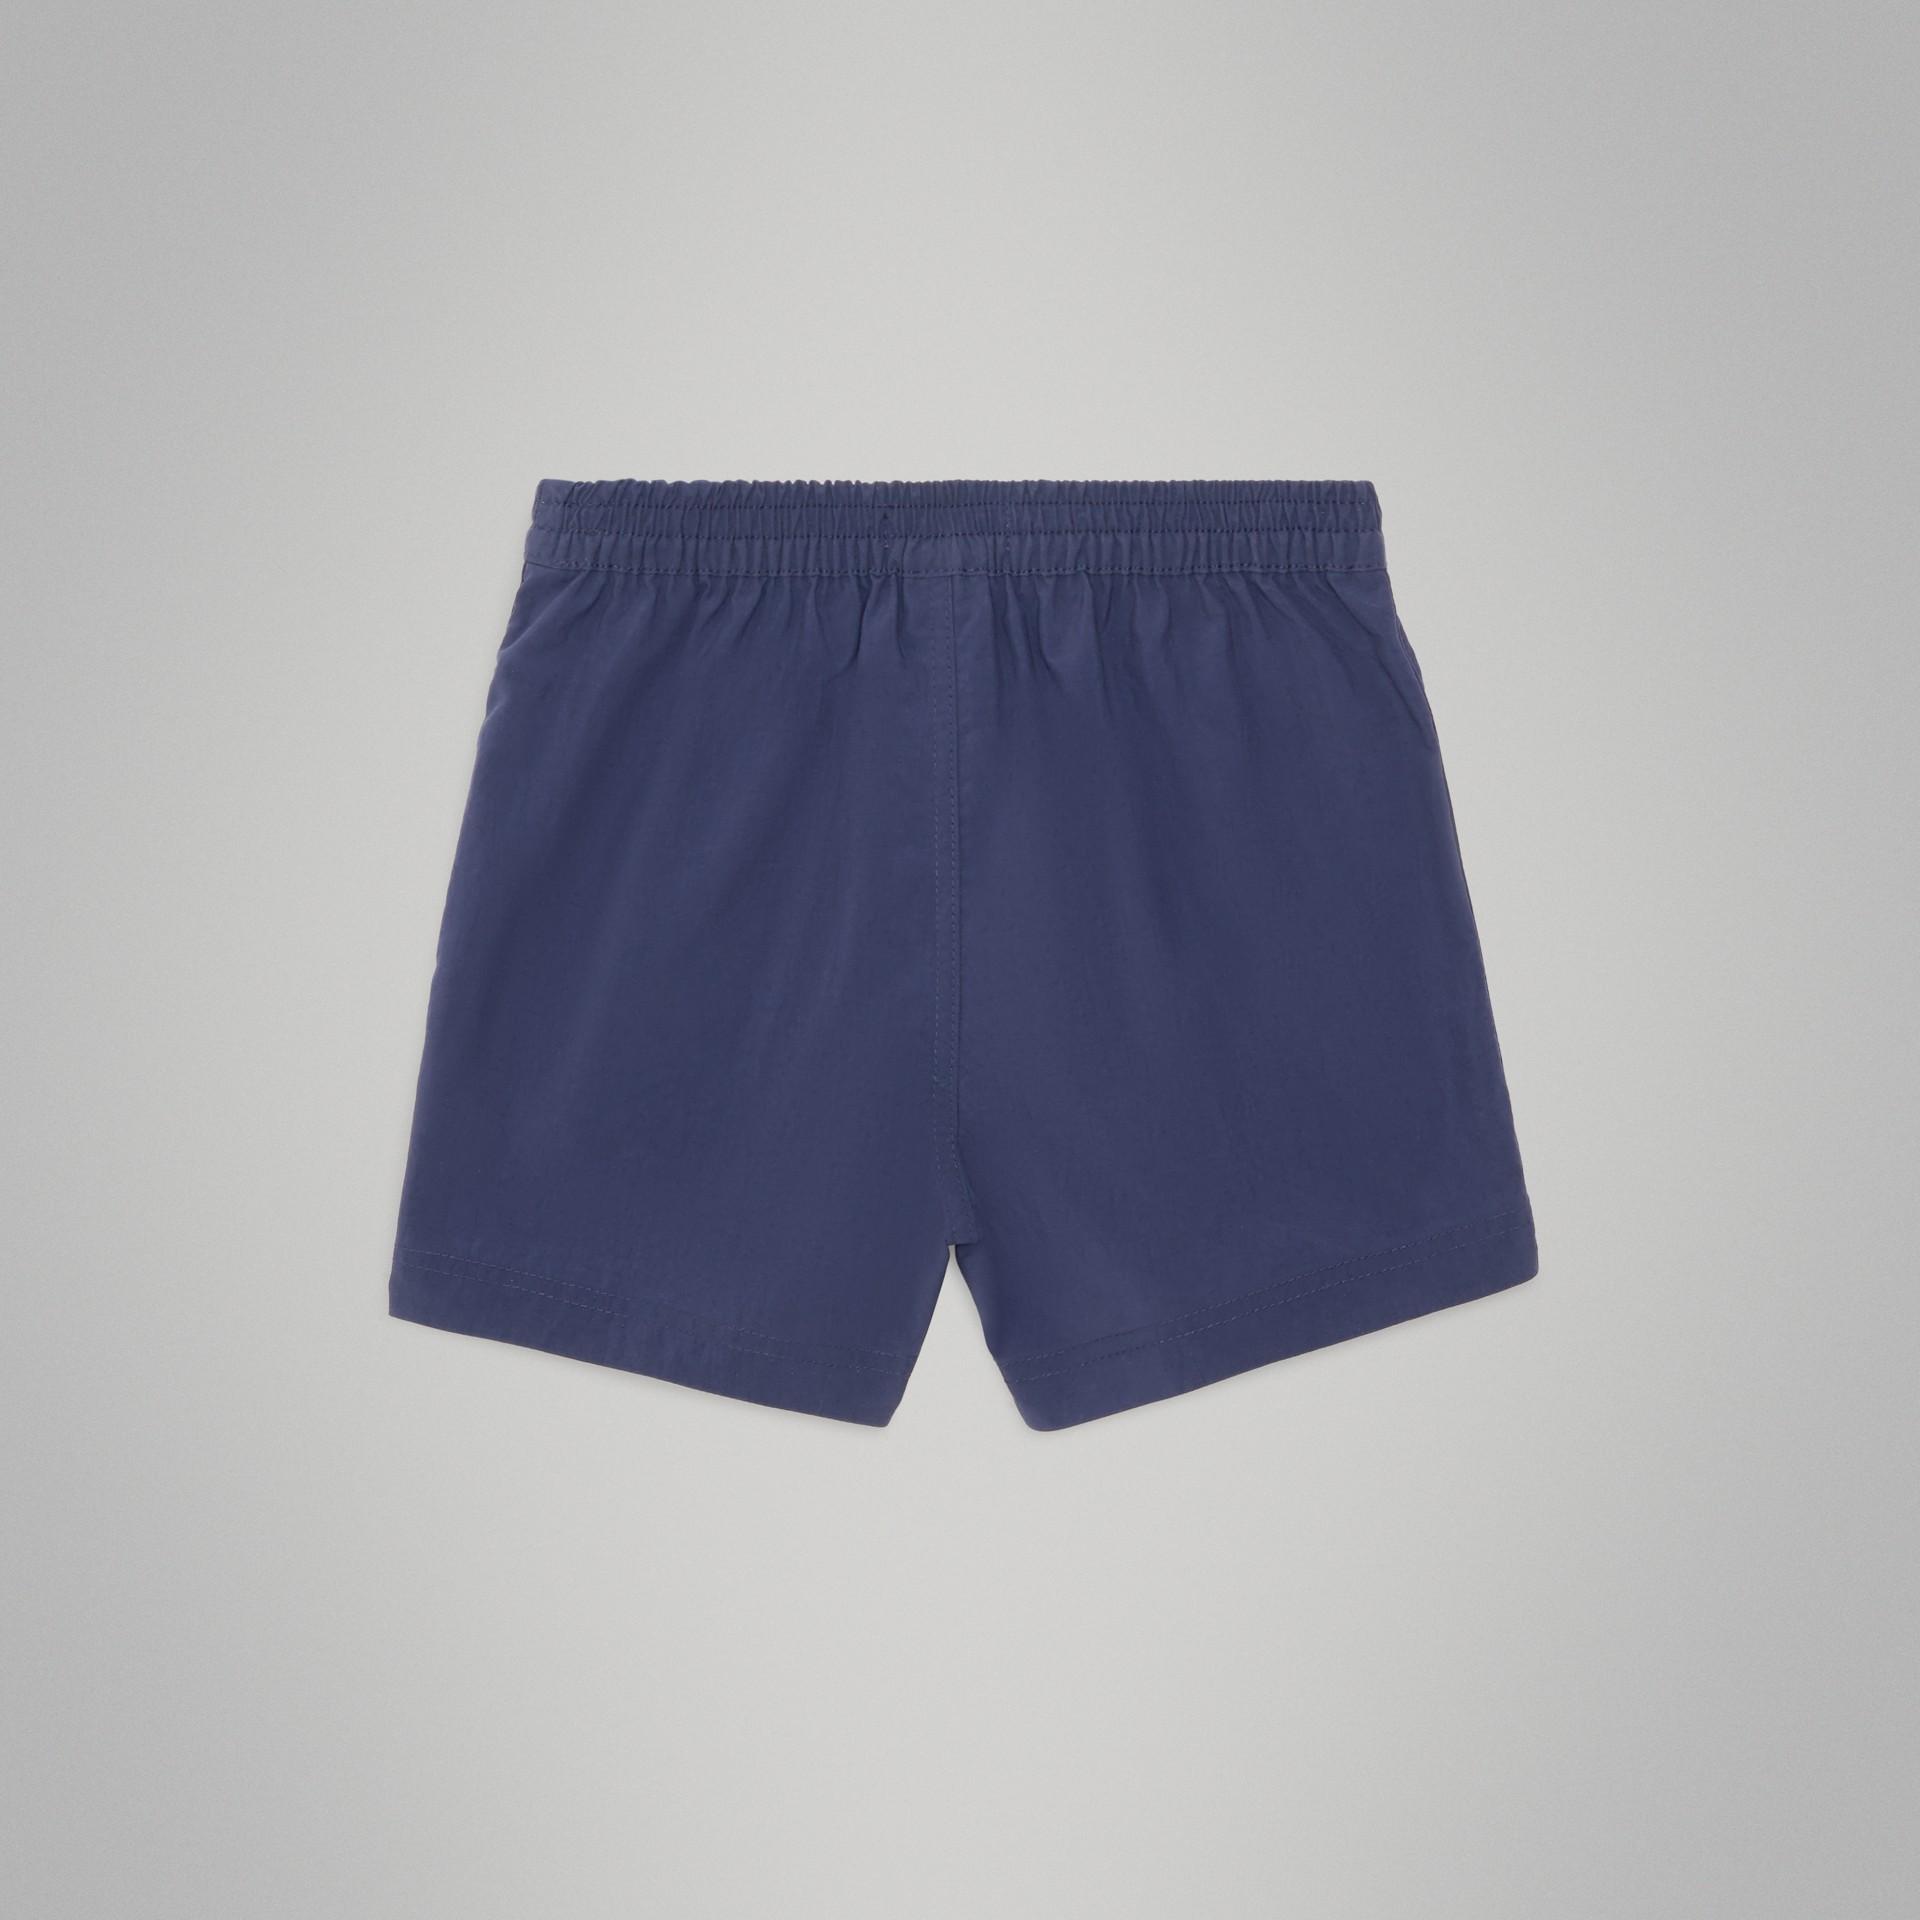 Drawcord Swim Shorts in Indigo - Children | Burberry Australia - gallery image 3